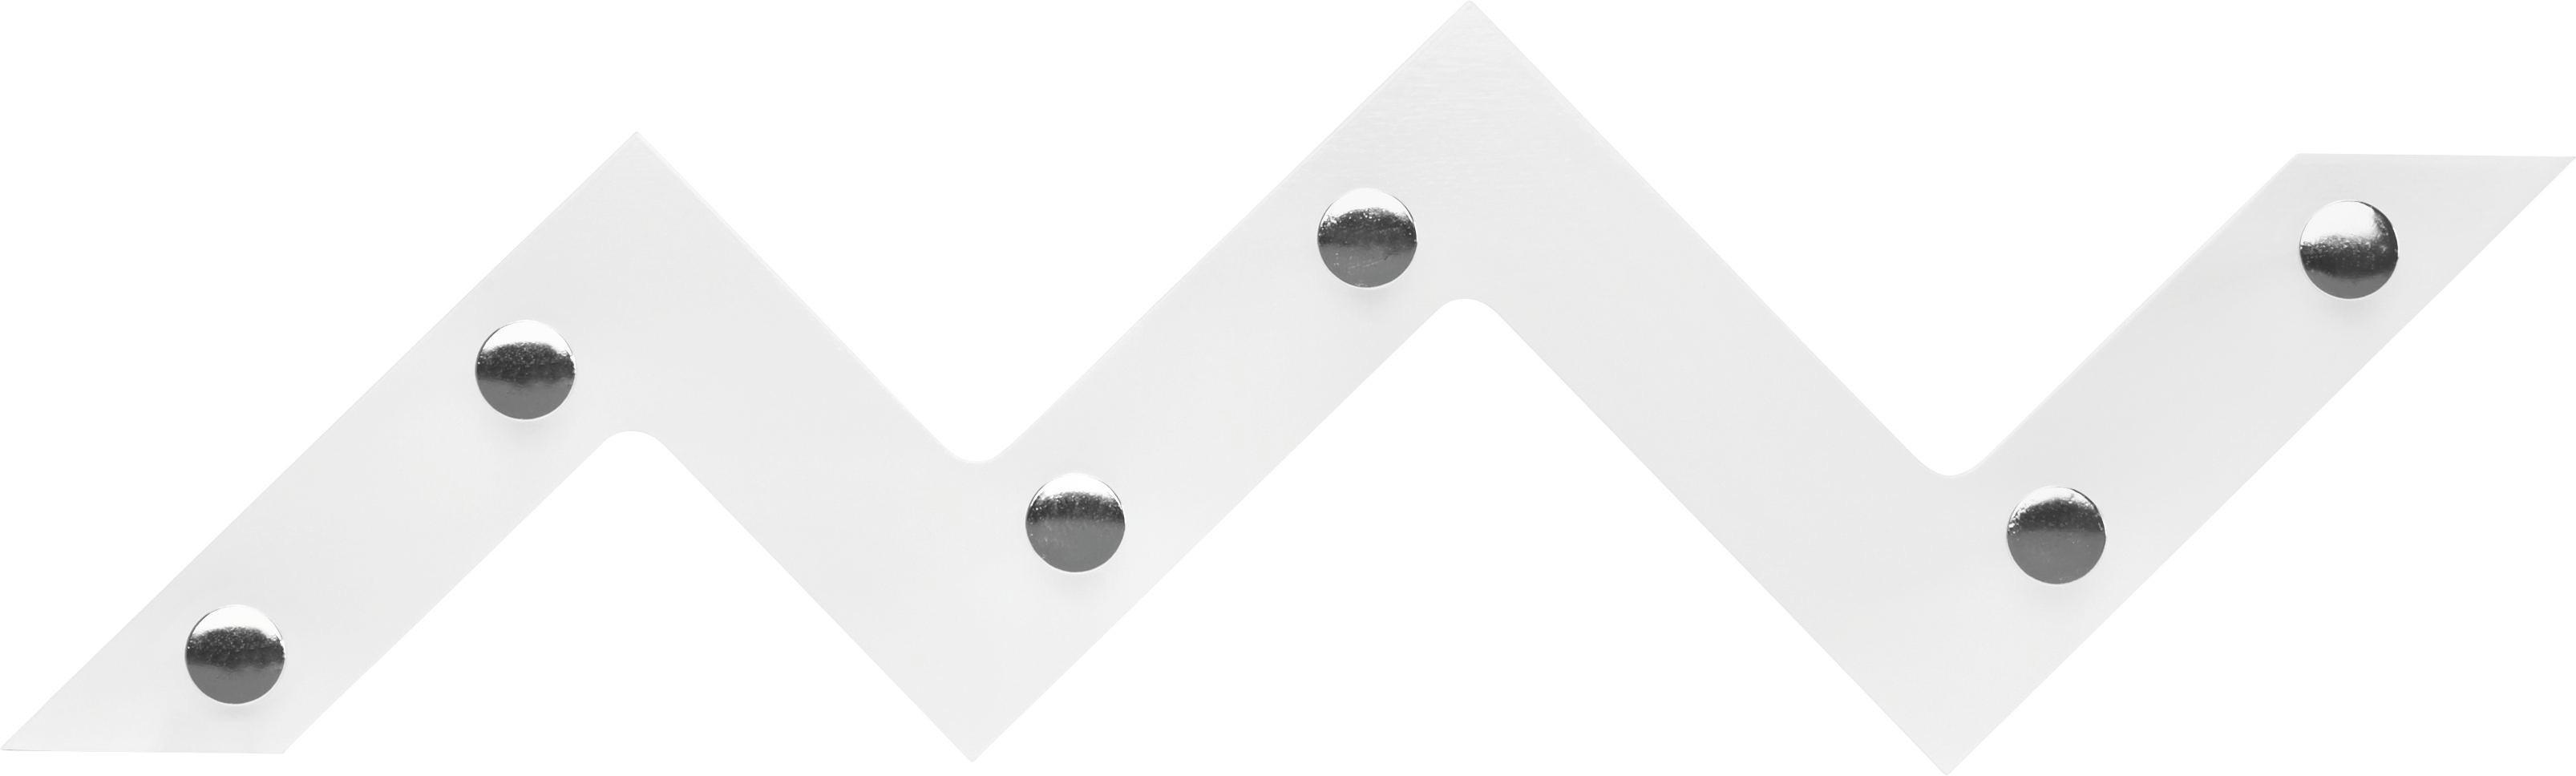 GARDEROBA ZIDNA - bijela/boje kroma, Design, drvni materijal/metal (56/34/3cm) - LESNINA-XXXL